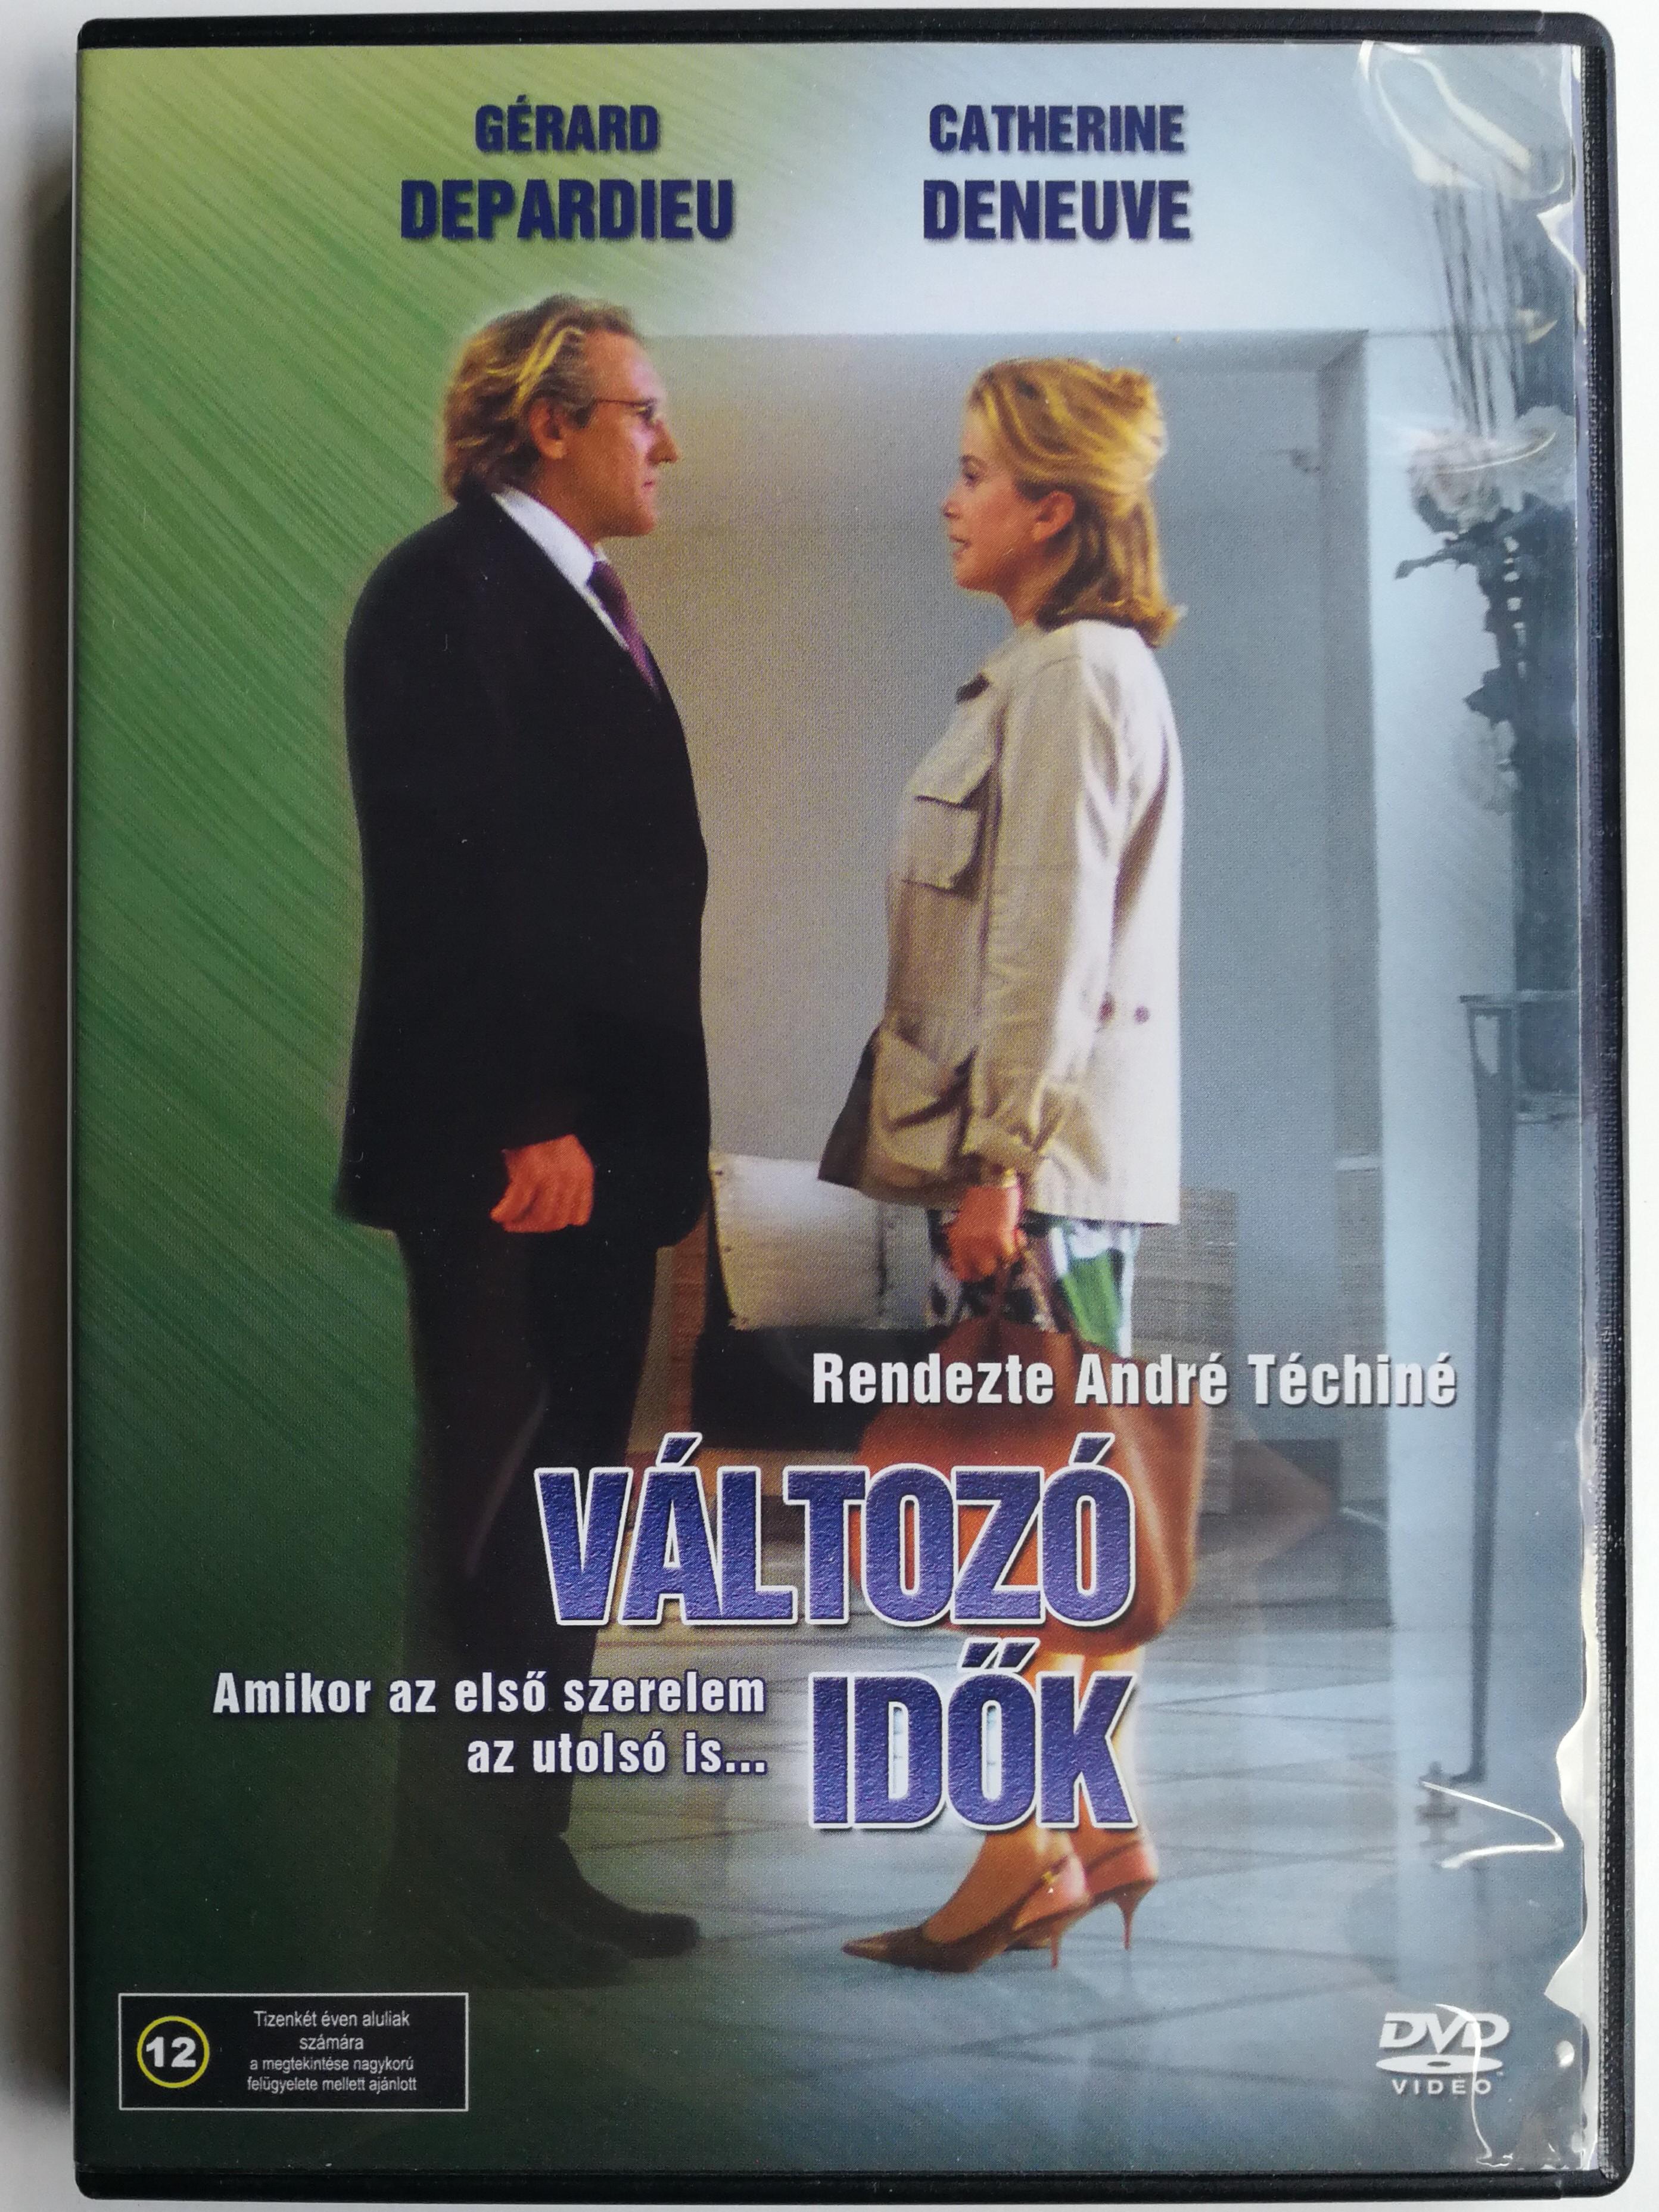 les-temps-qui-changent-dvd-2004-v-ltoz-id-k-1.jpg